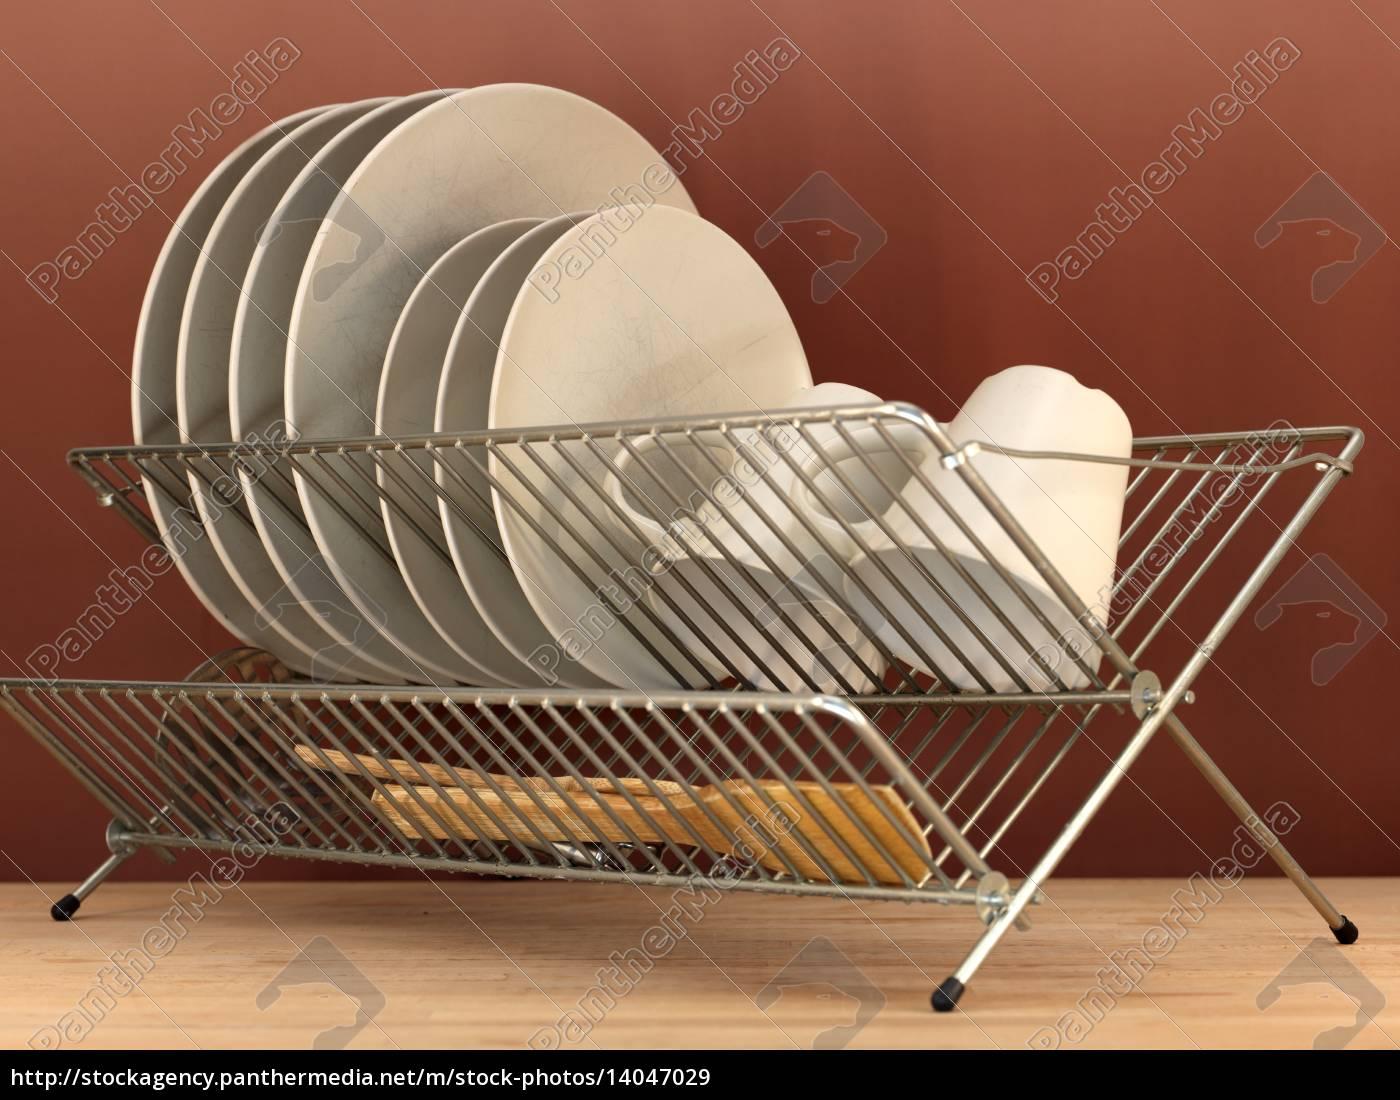 dish, rack - 14047029